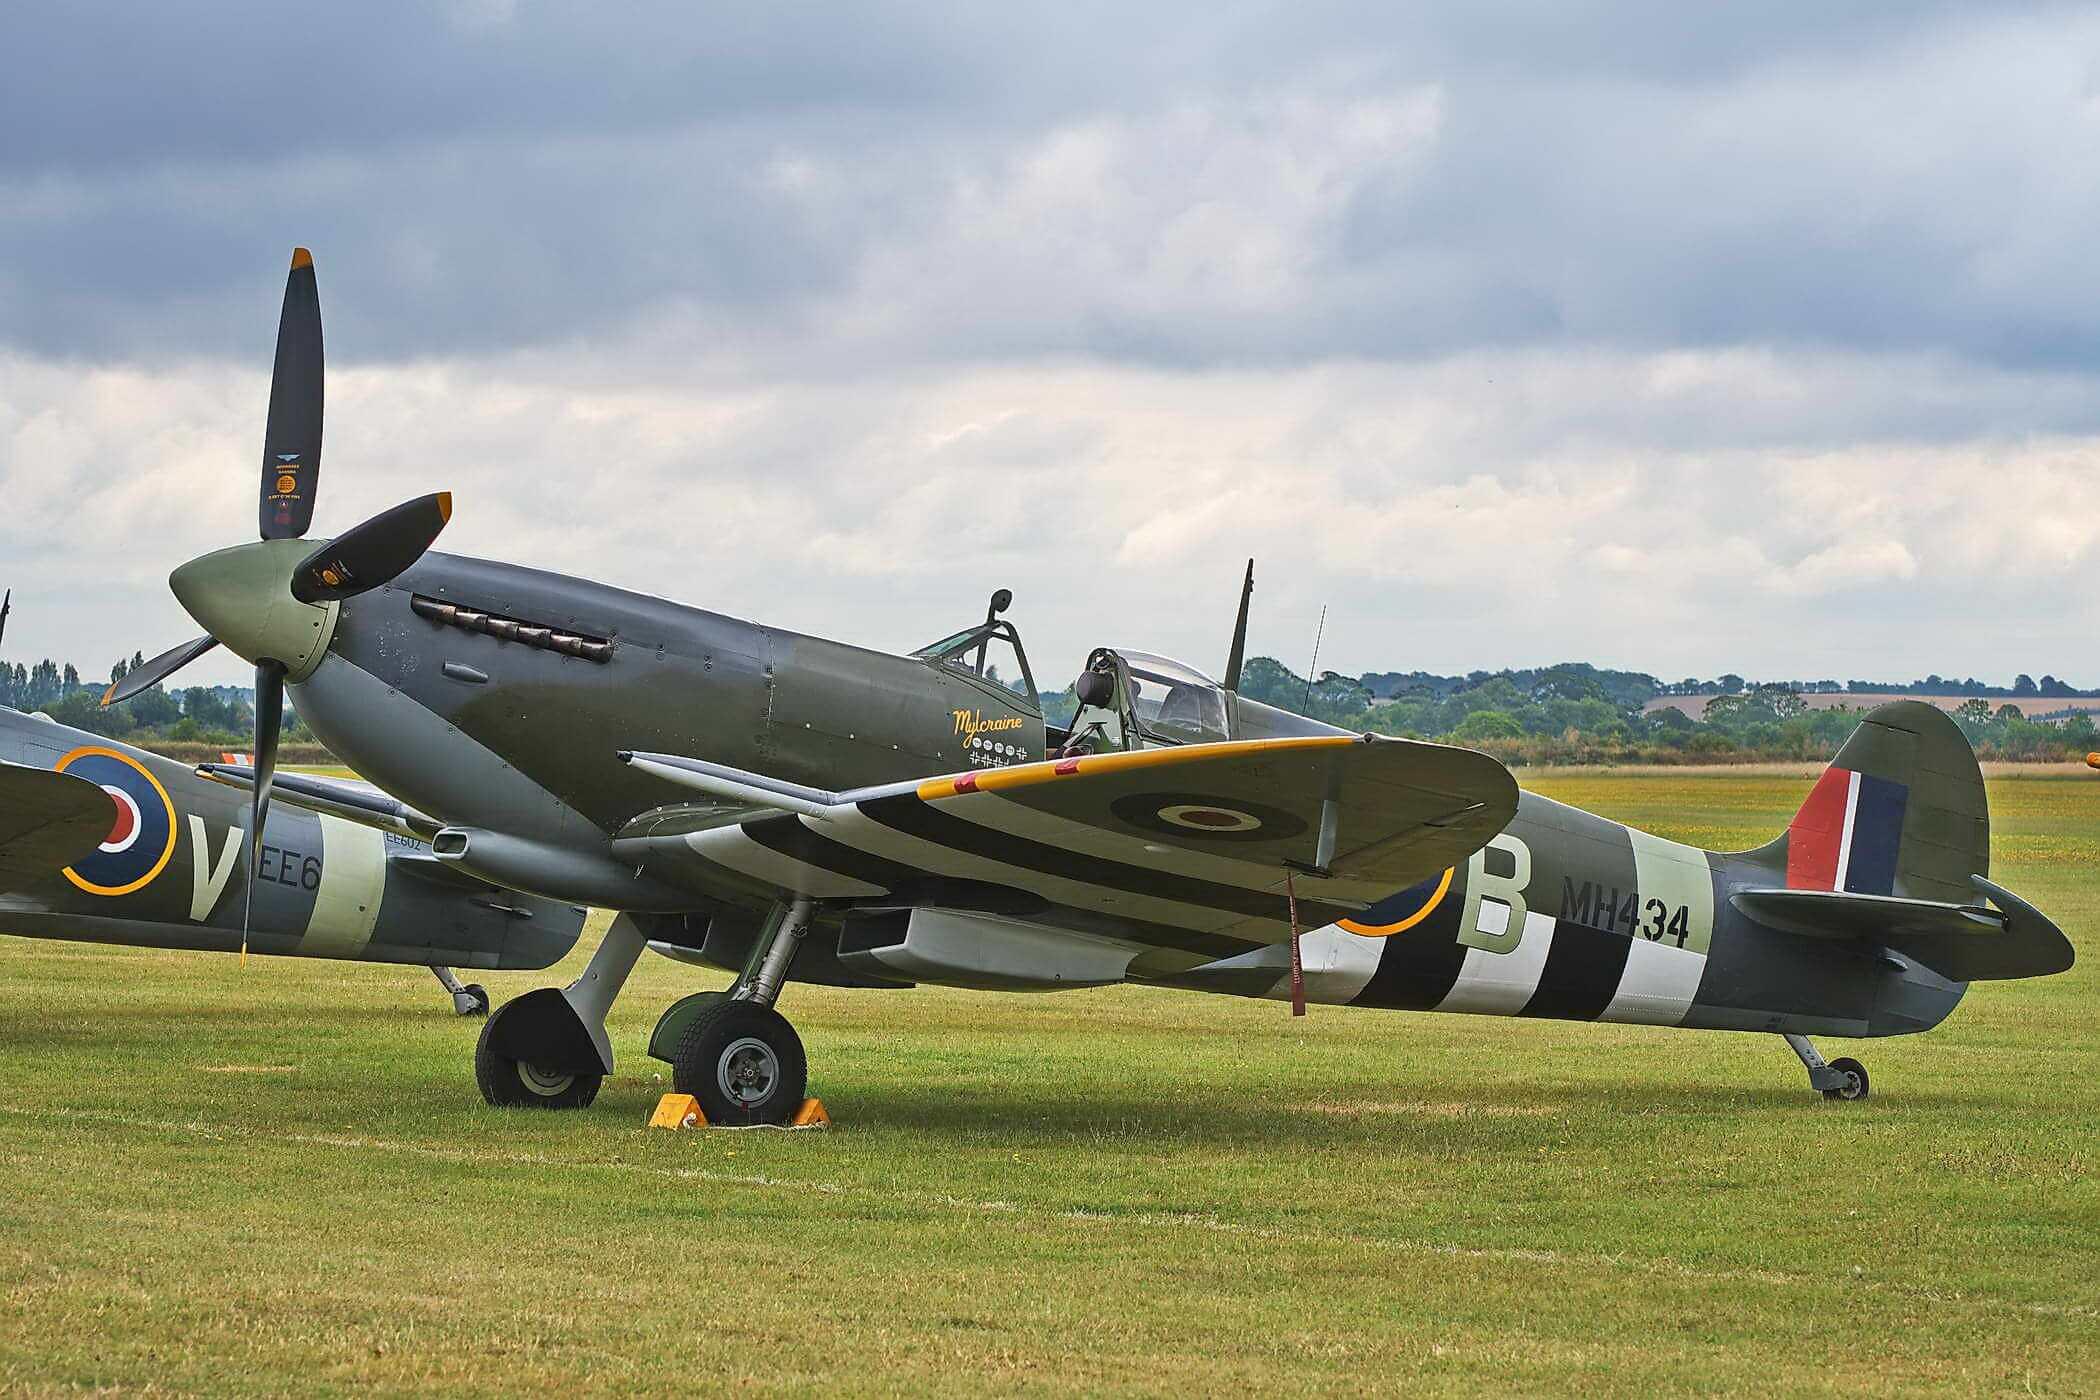 Spitfire LF IX MH434